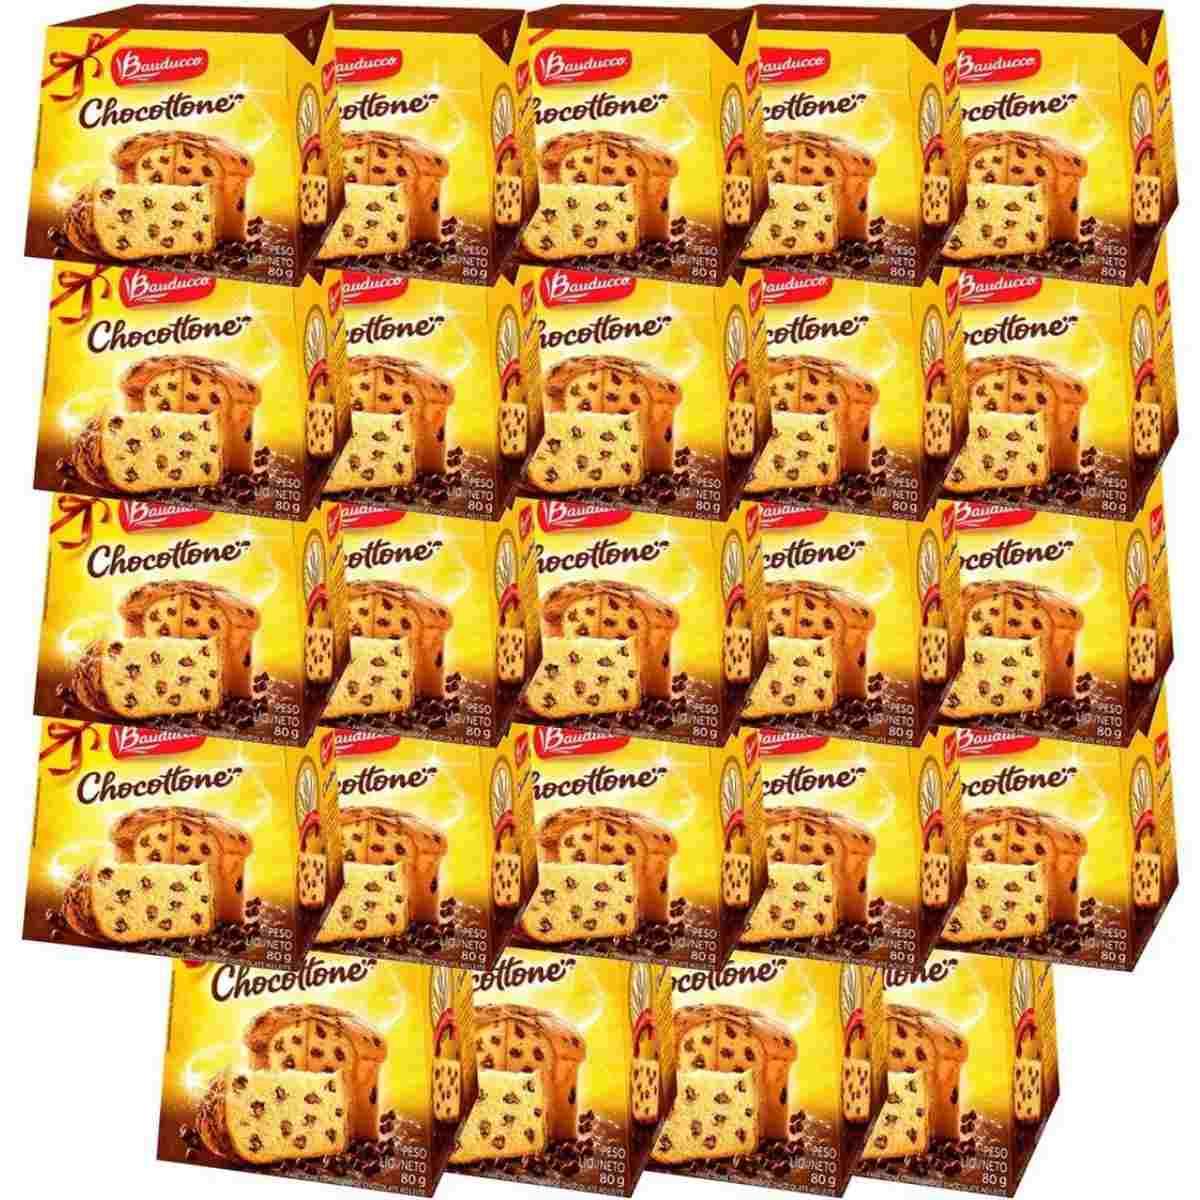 Kit Mini Panetone De Chocolate Chocottone 80g Bauducco Caixa C/24 unidades